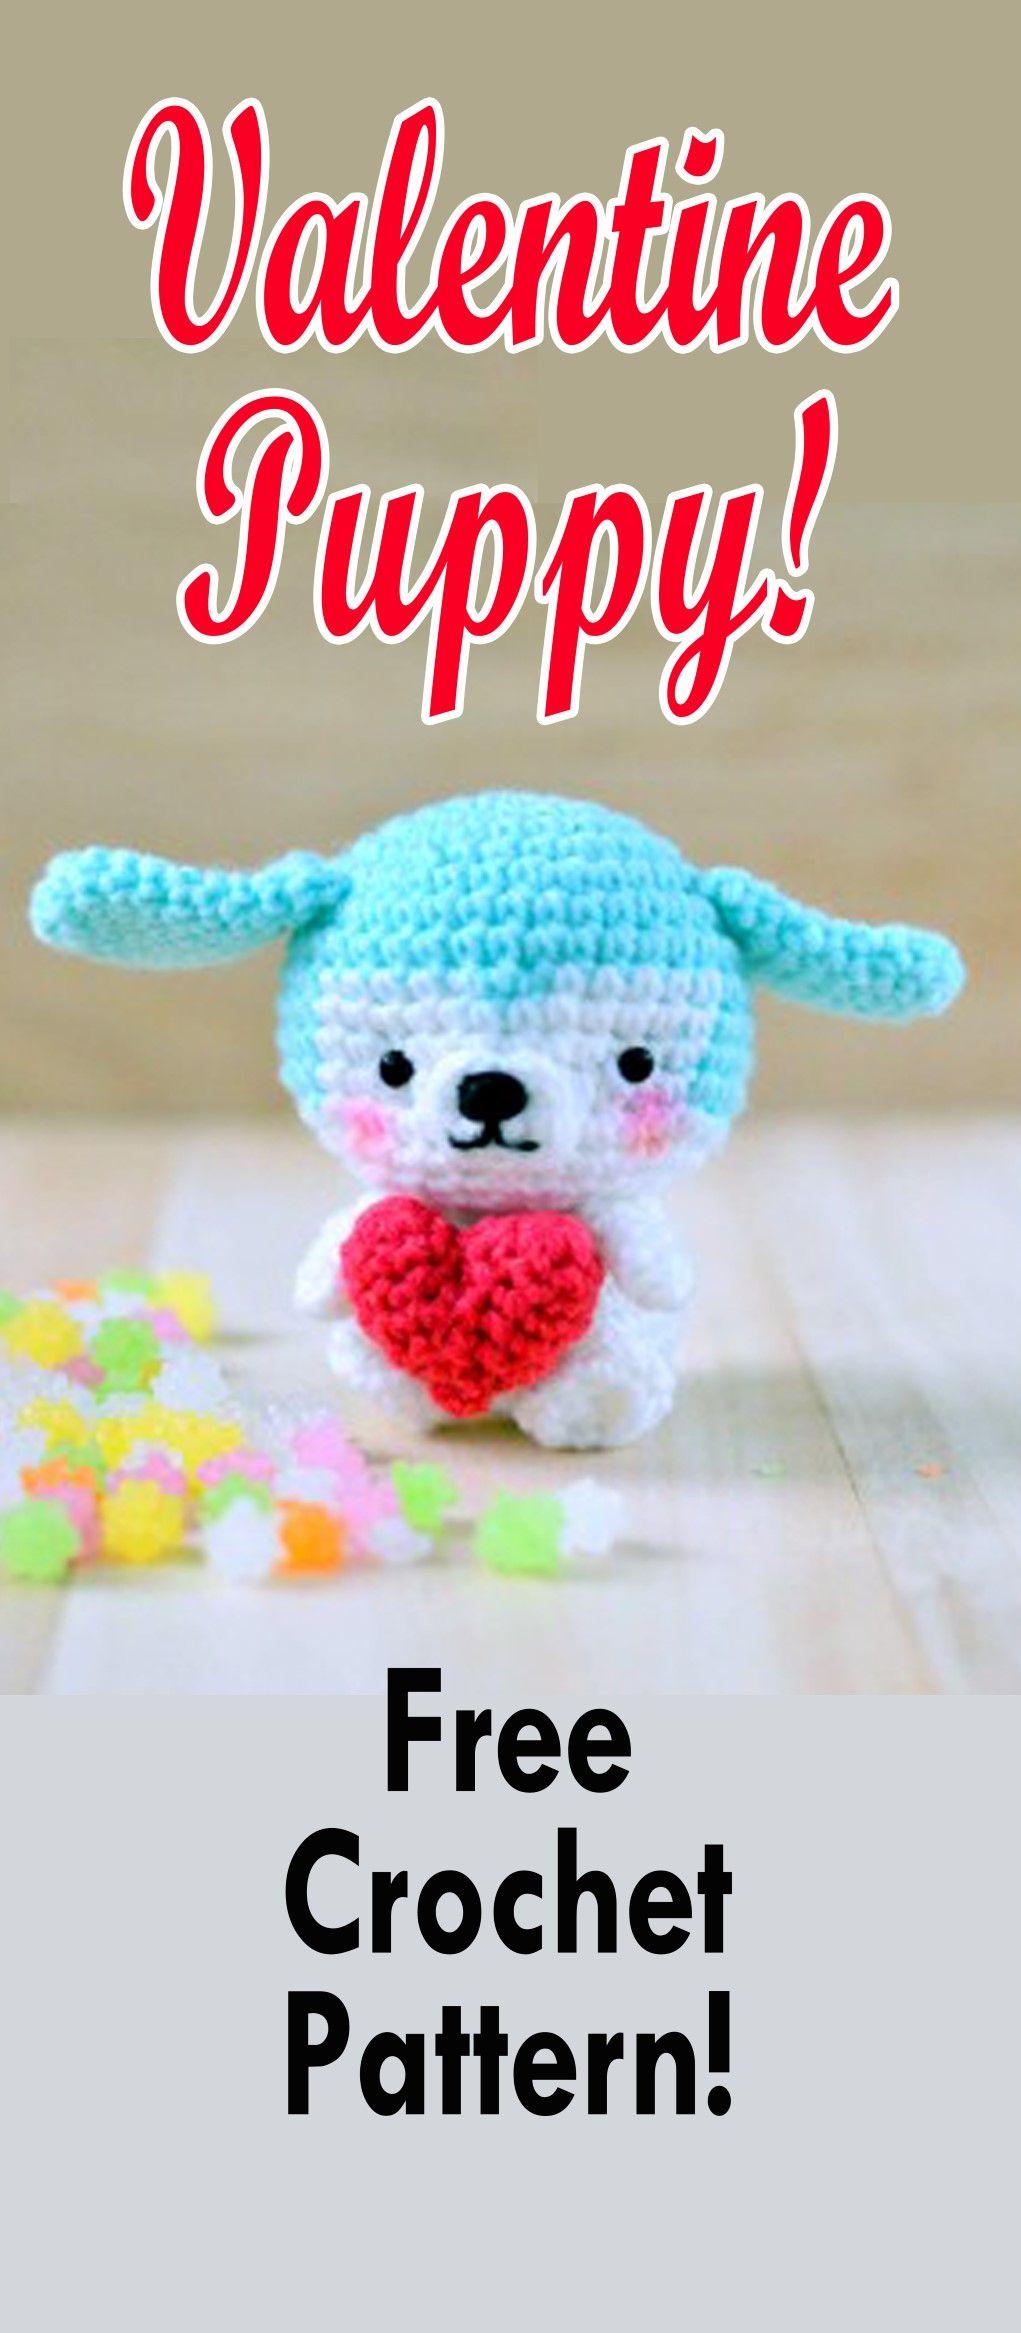 Valentines Animals Crochet It Pinterest Crochet Crochet